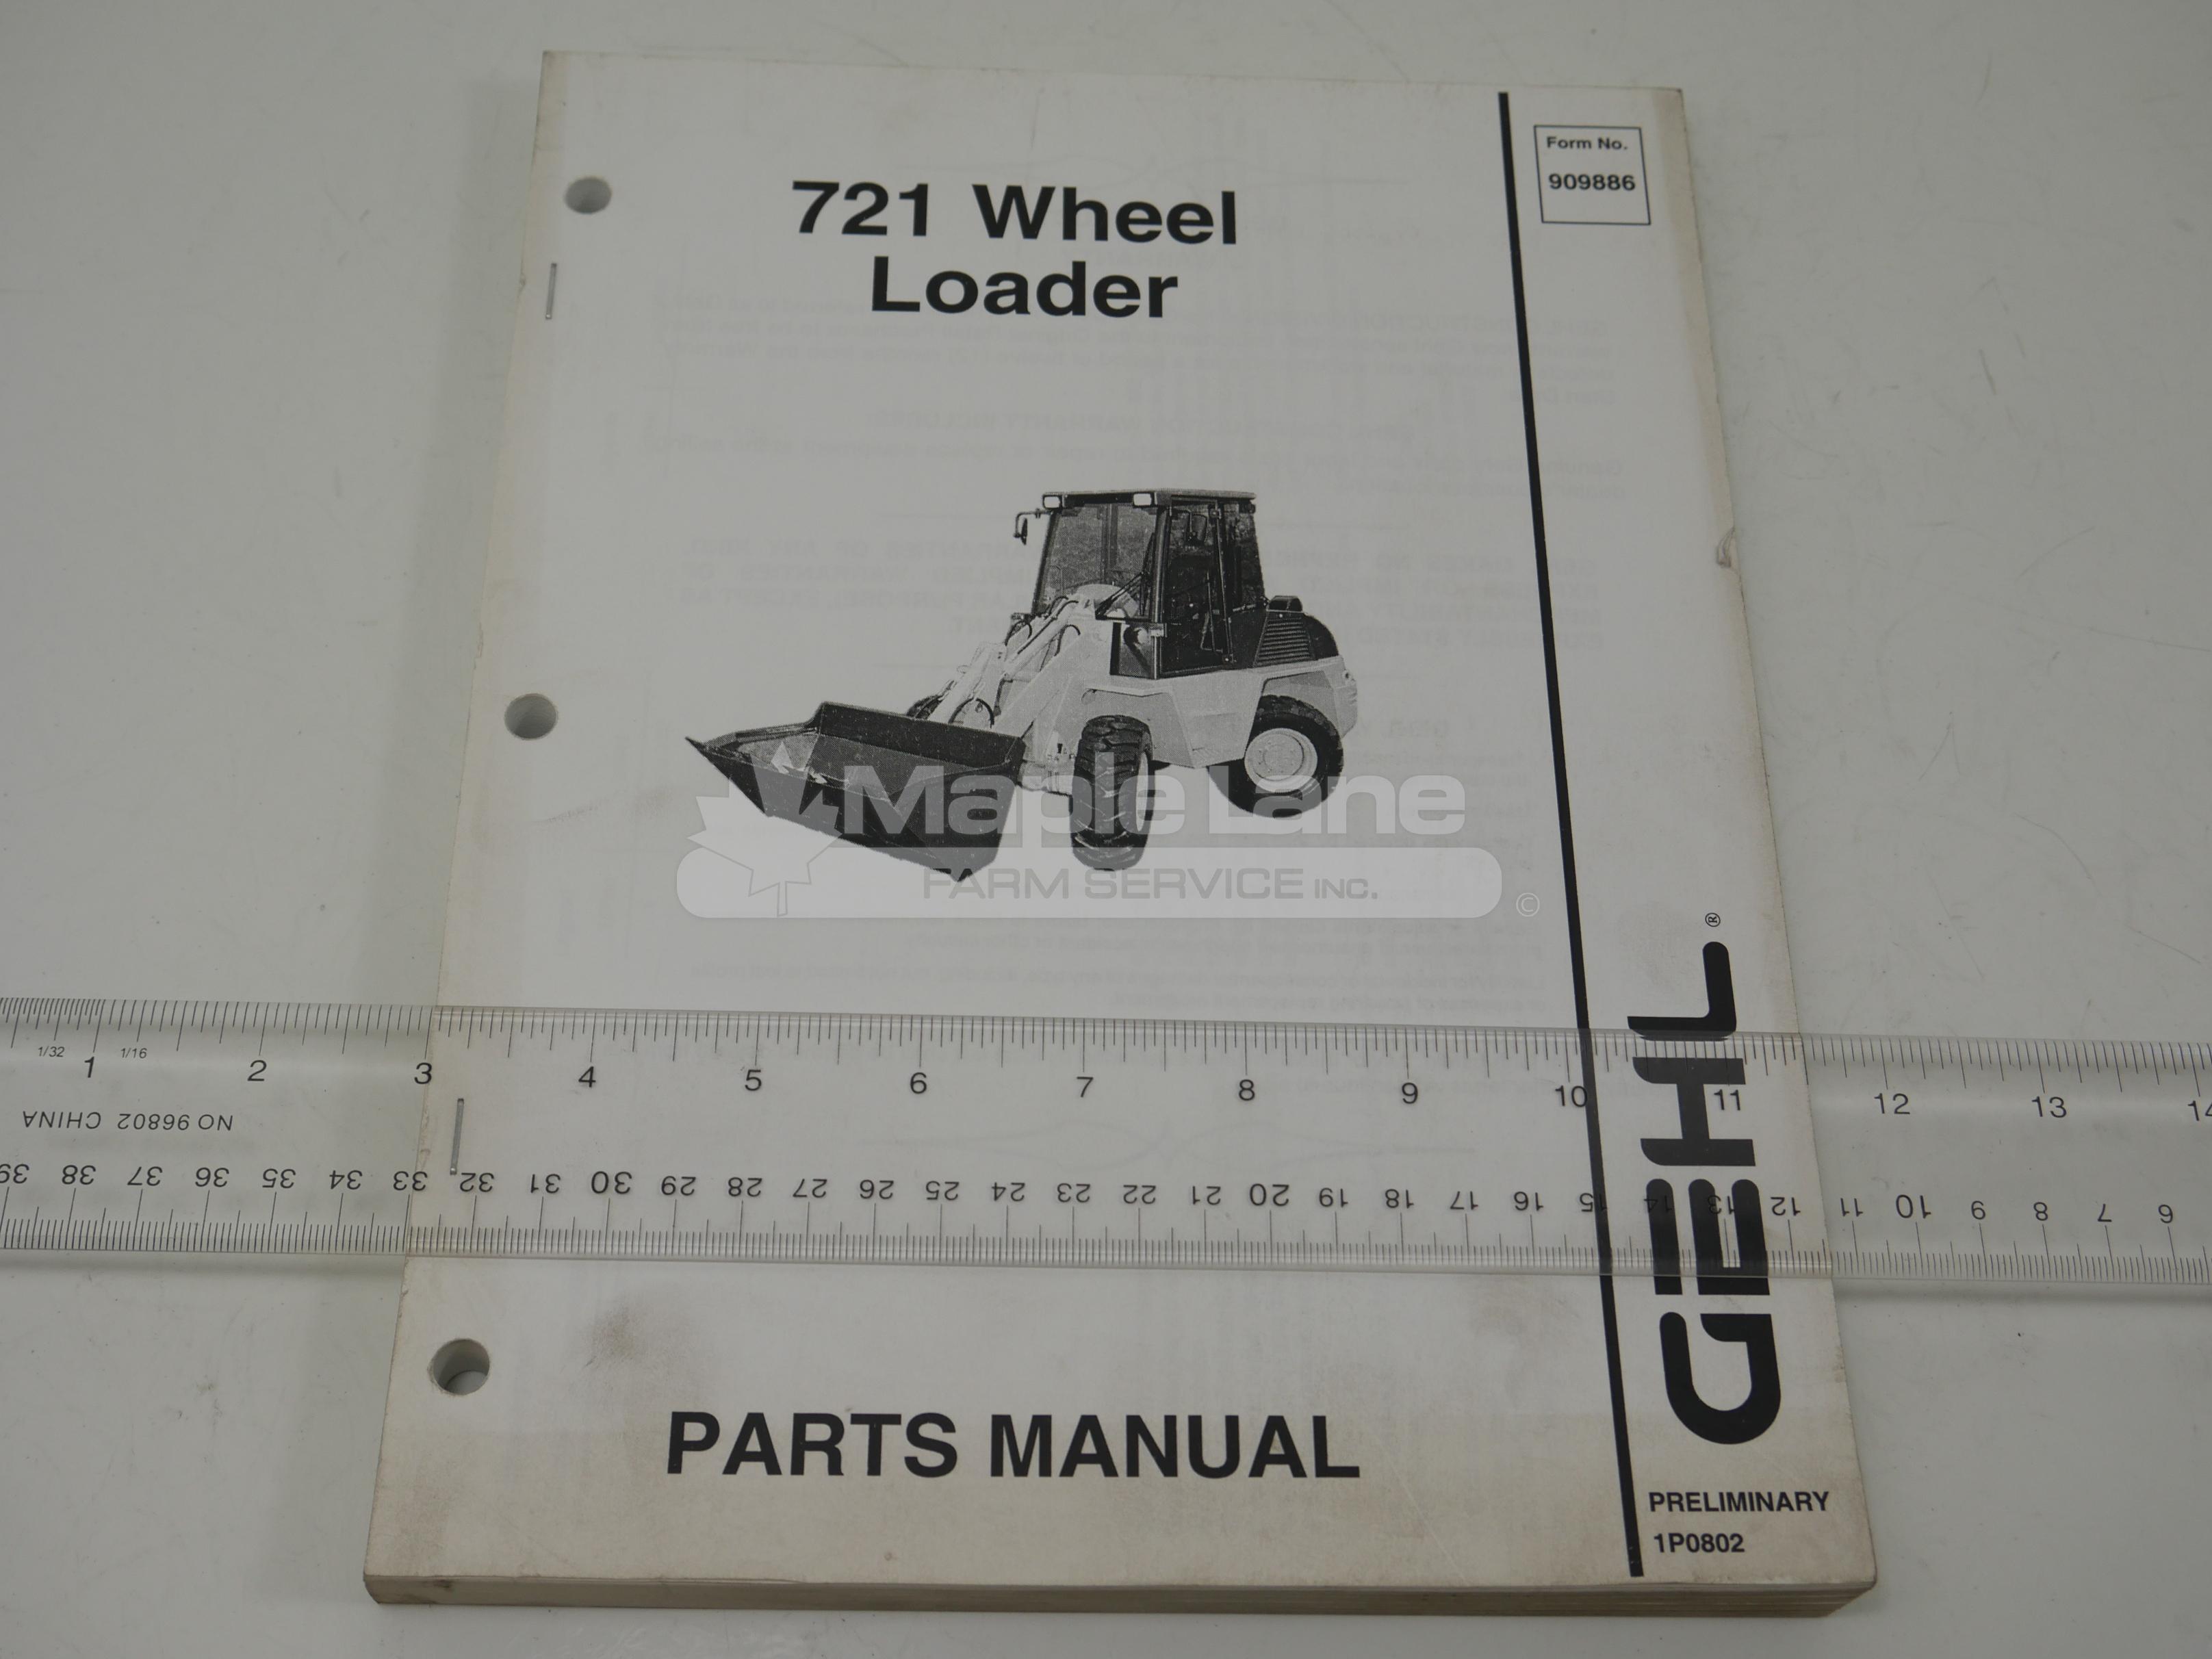 909886 Parts Manual